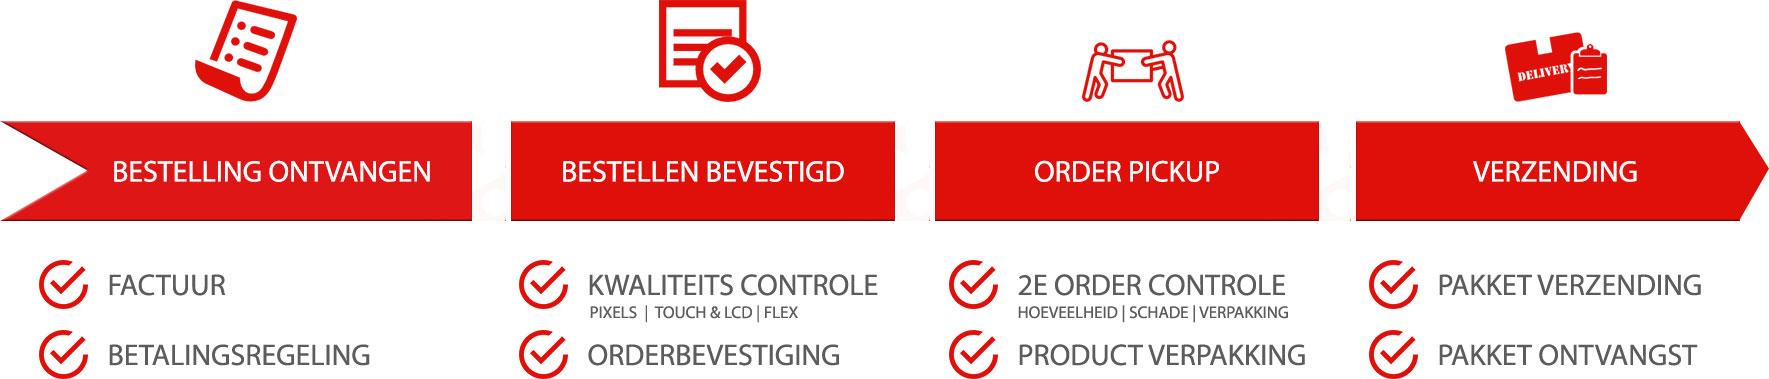 Werkproces bij GPC: Order, Order picking, Order bevestiging, Order verzending